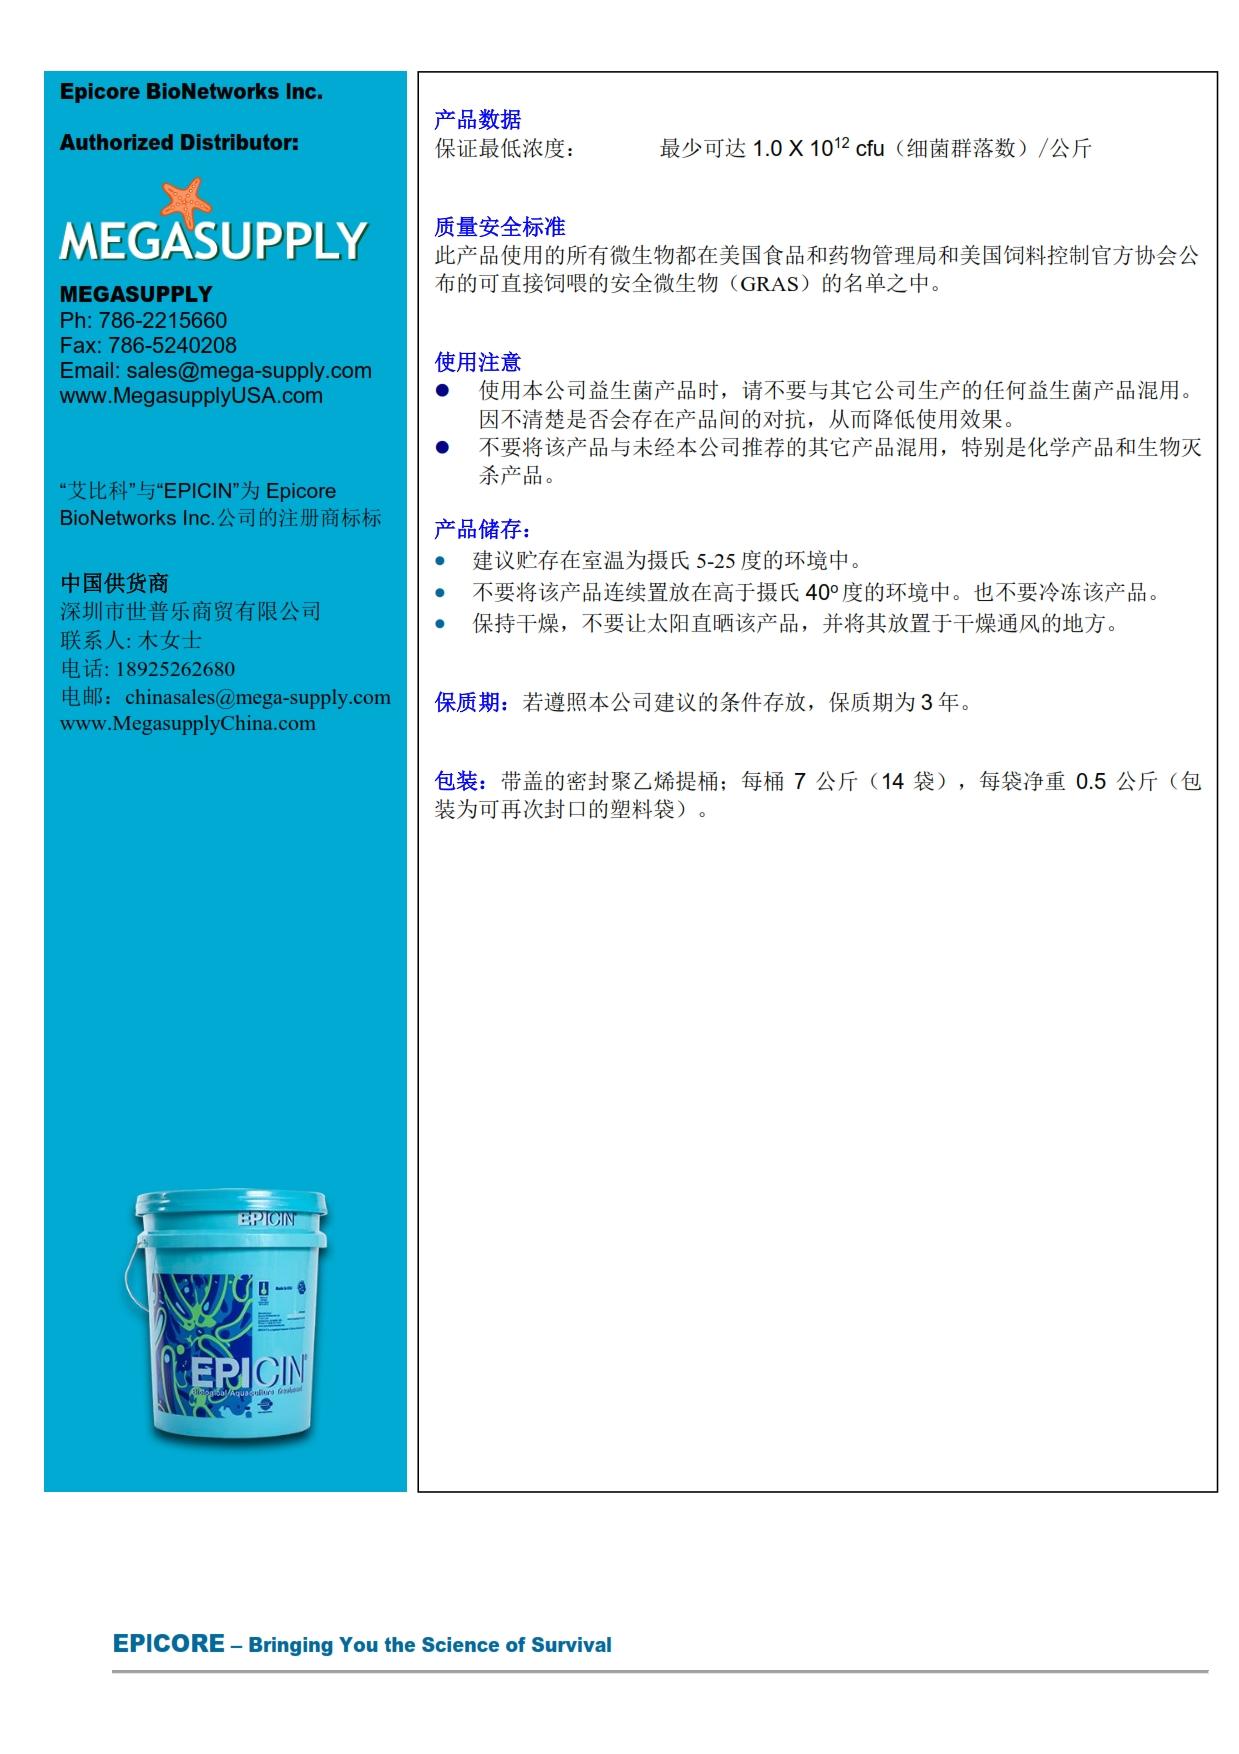 EPICIN-HOD-2014-cn-V2d-web_002